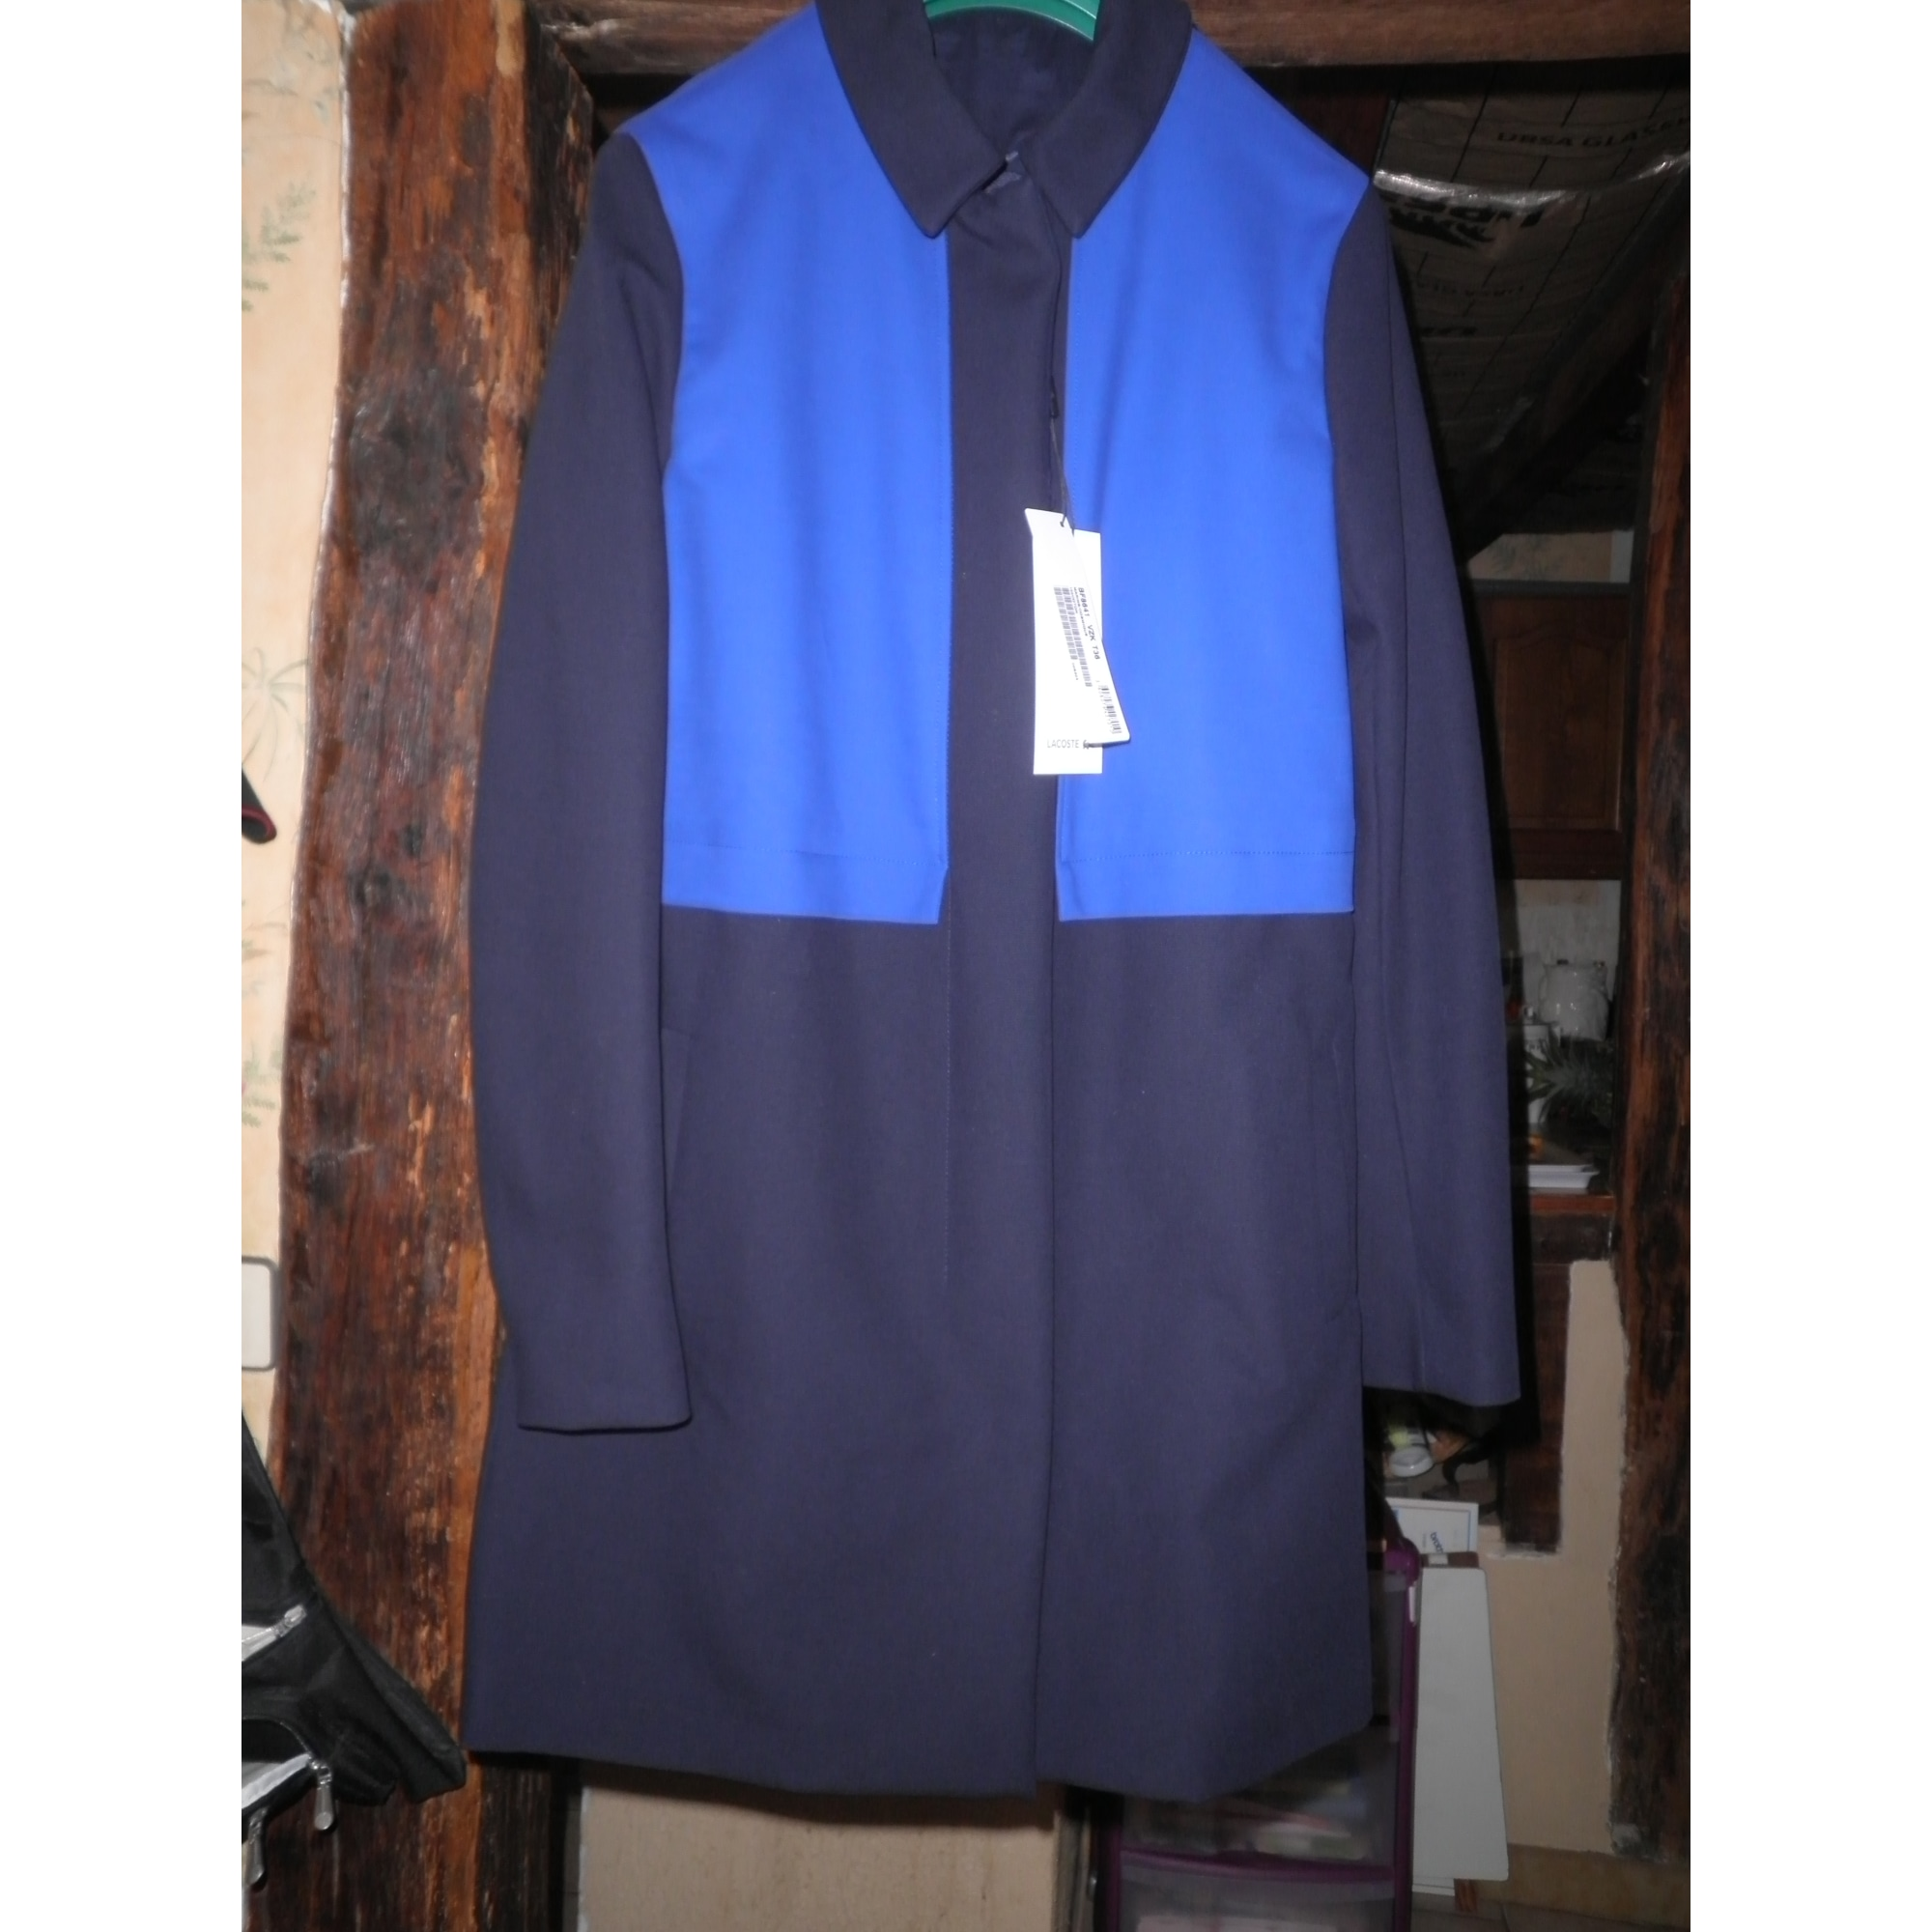 8844412c68 Manteau LACOSTE Bleu, bleu marine, bleu turquoise